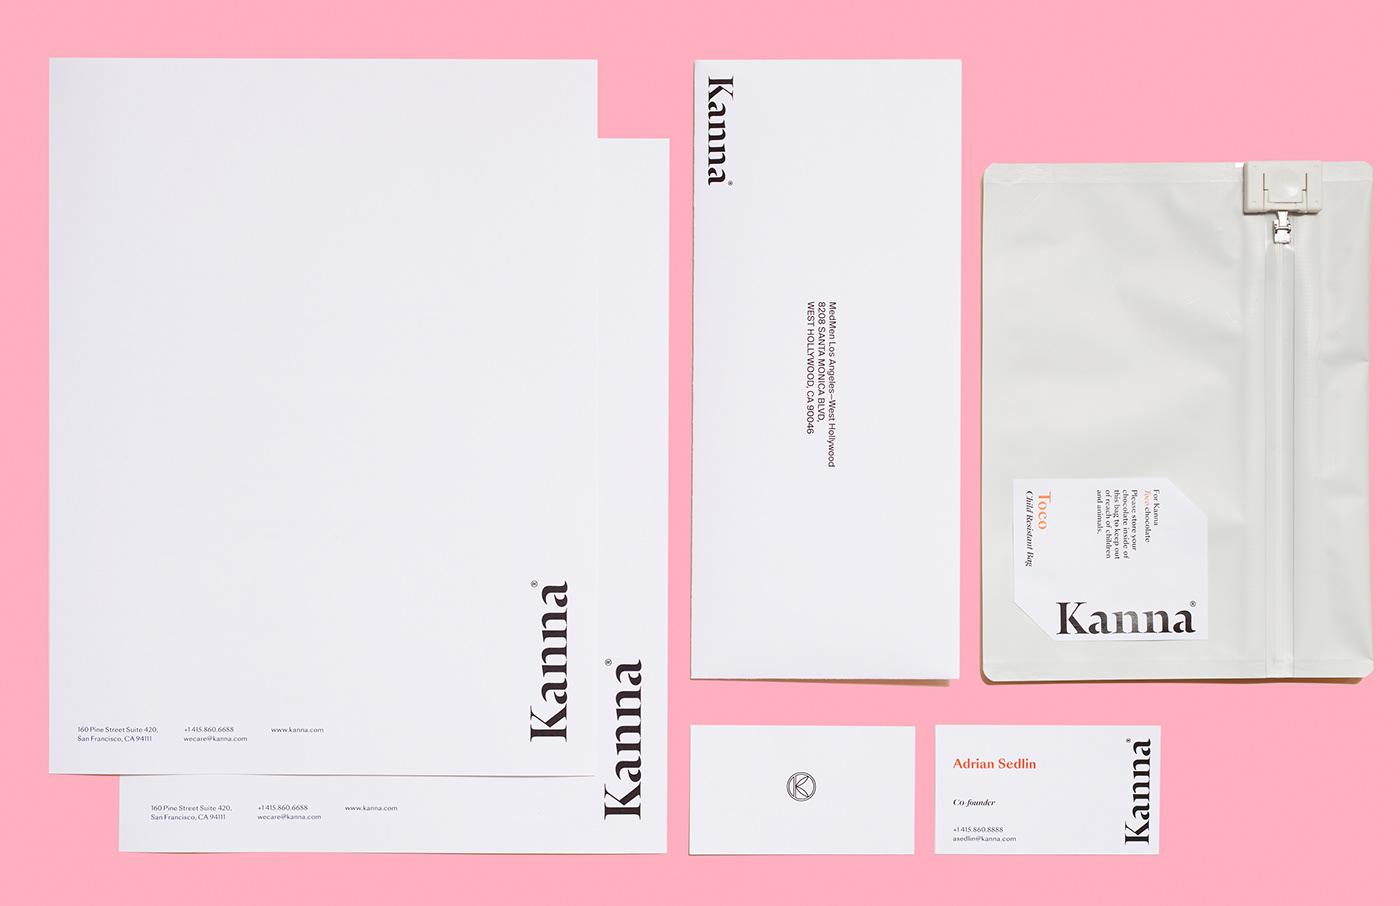 Kanna—a recreational cannabis brand on Behance